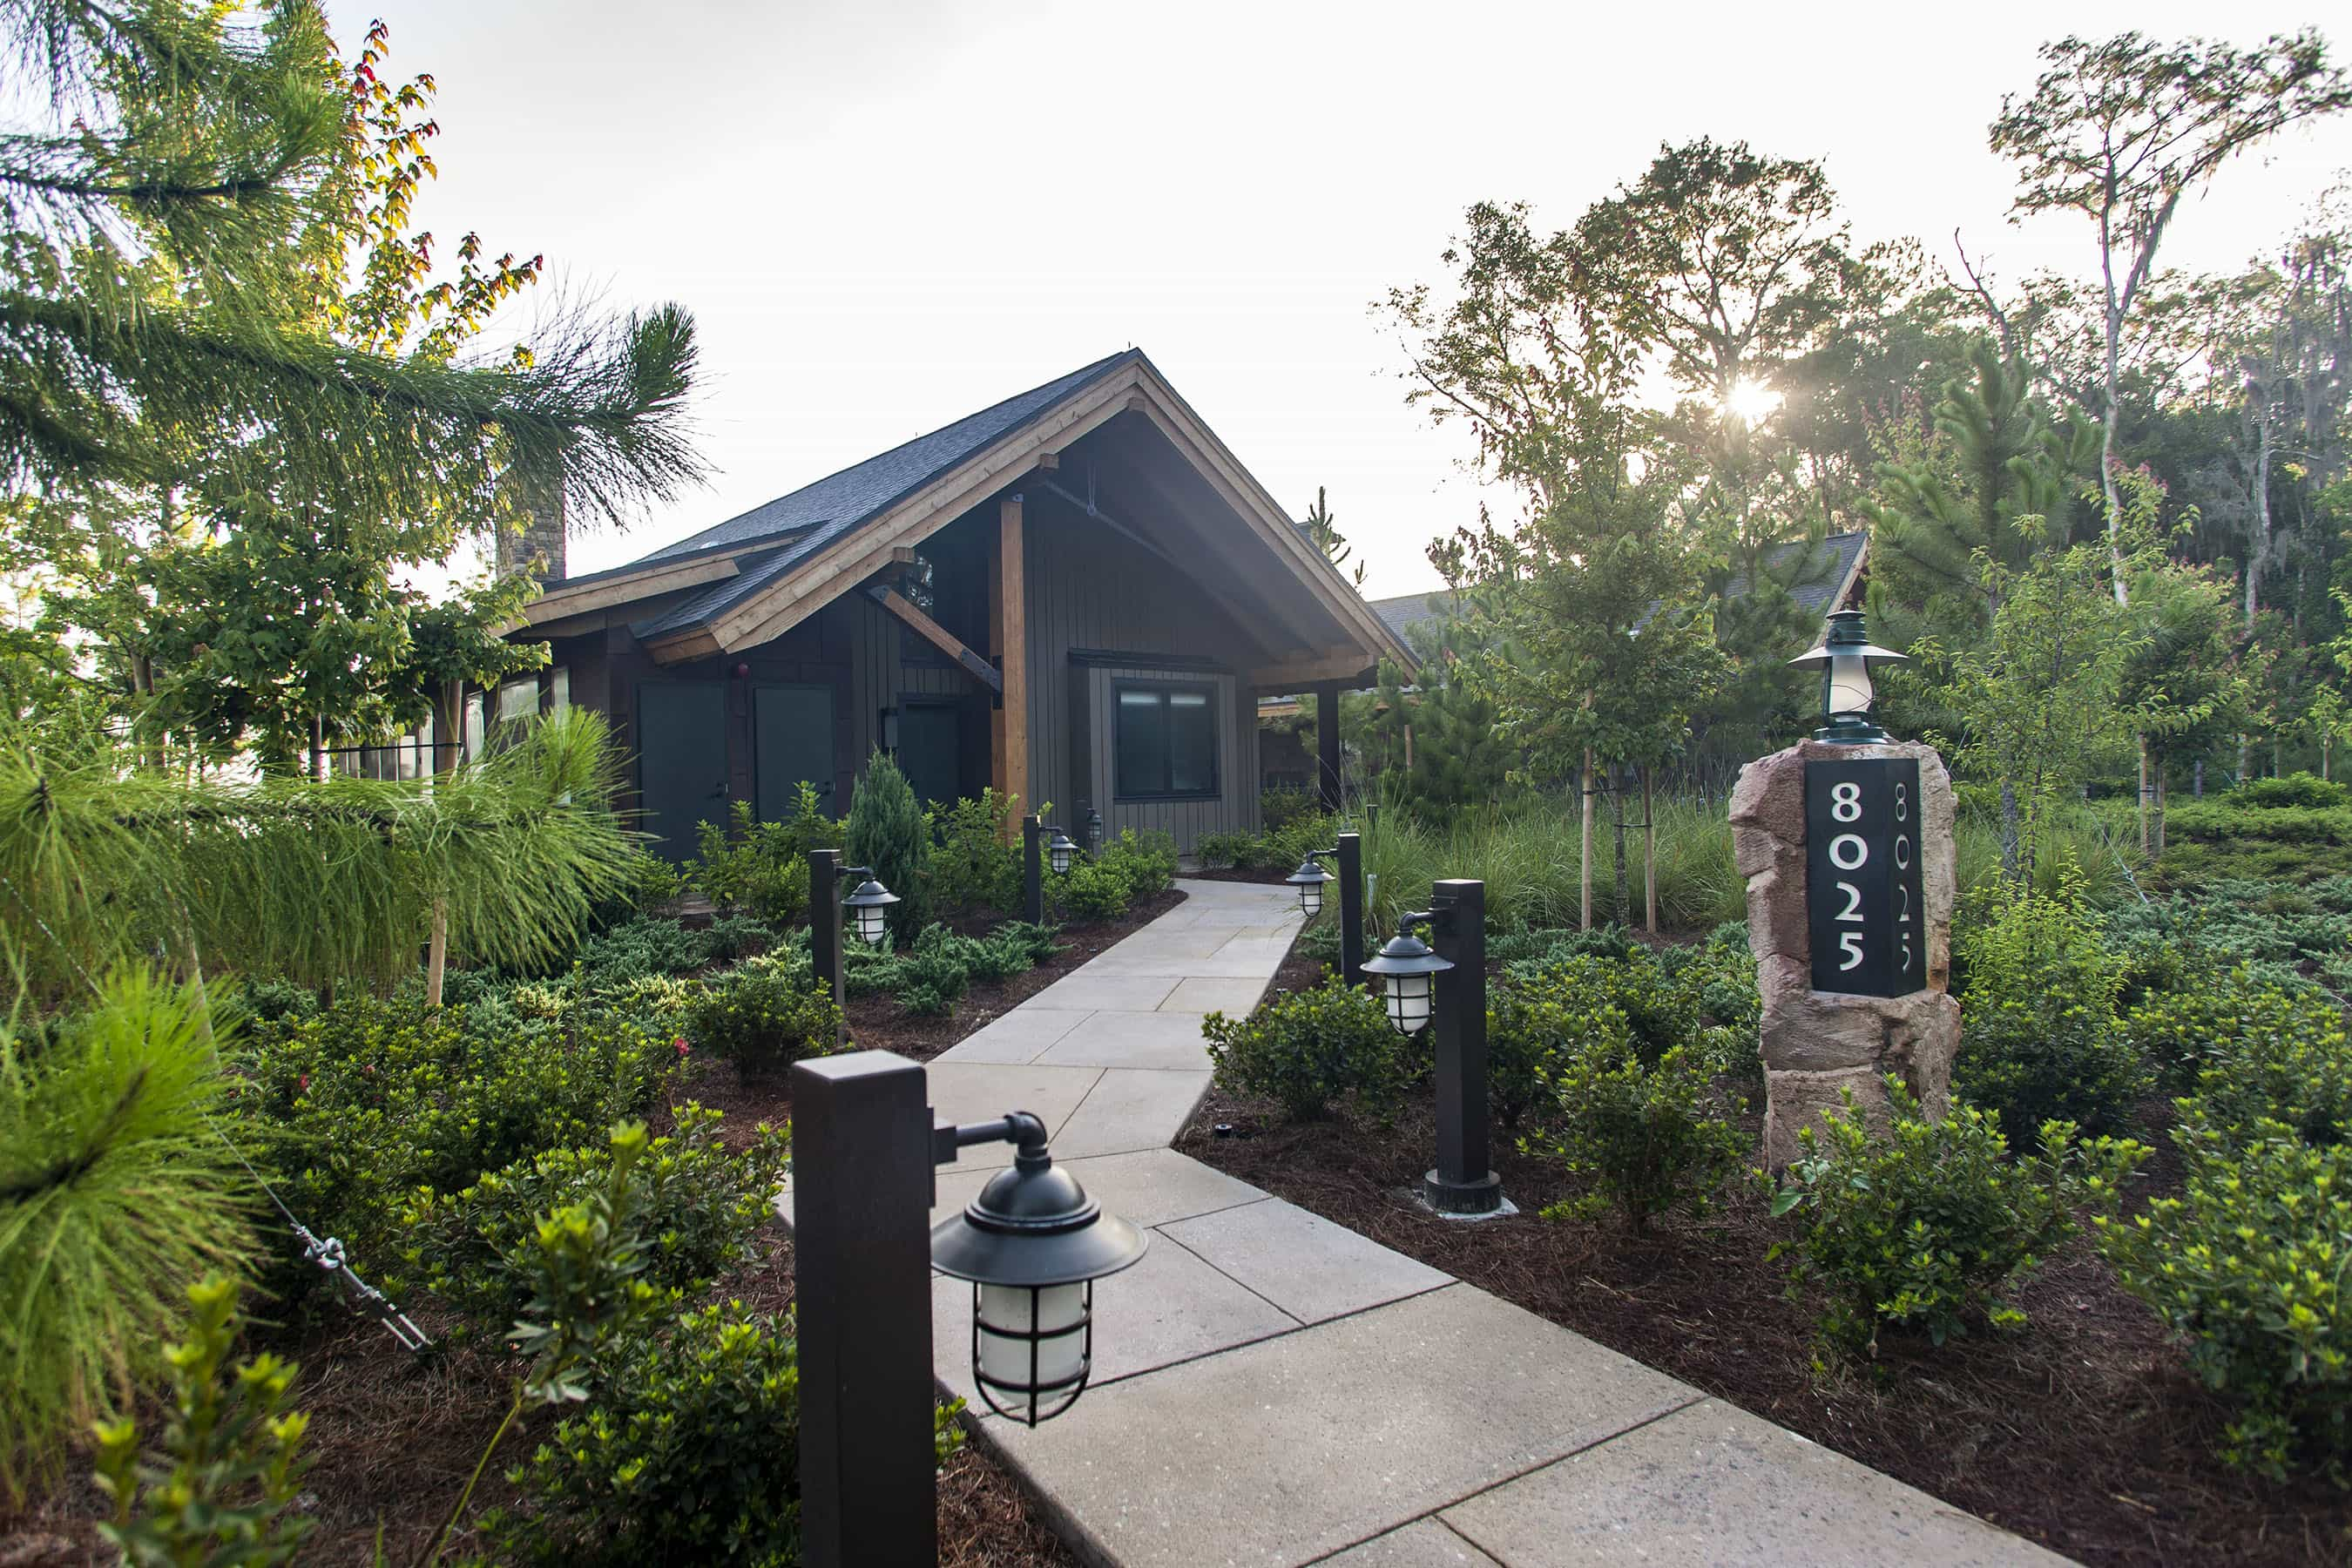 Disney s copper creek villas cabins dixie delights for Copper creek villas cabins